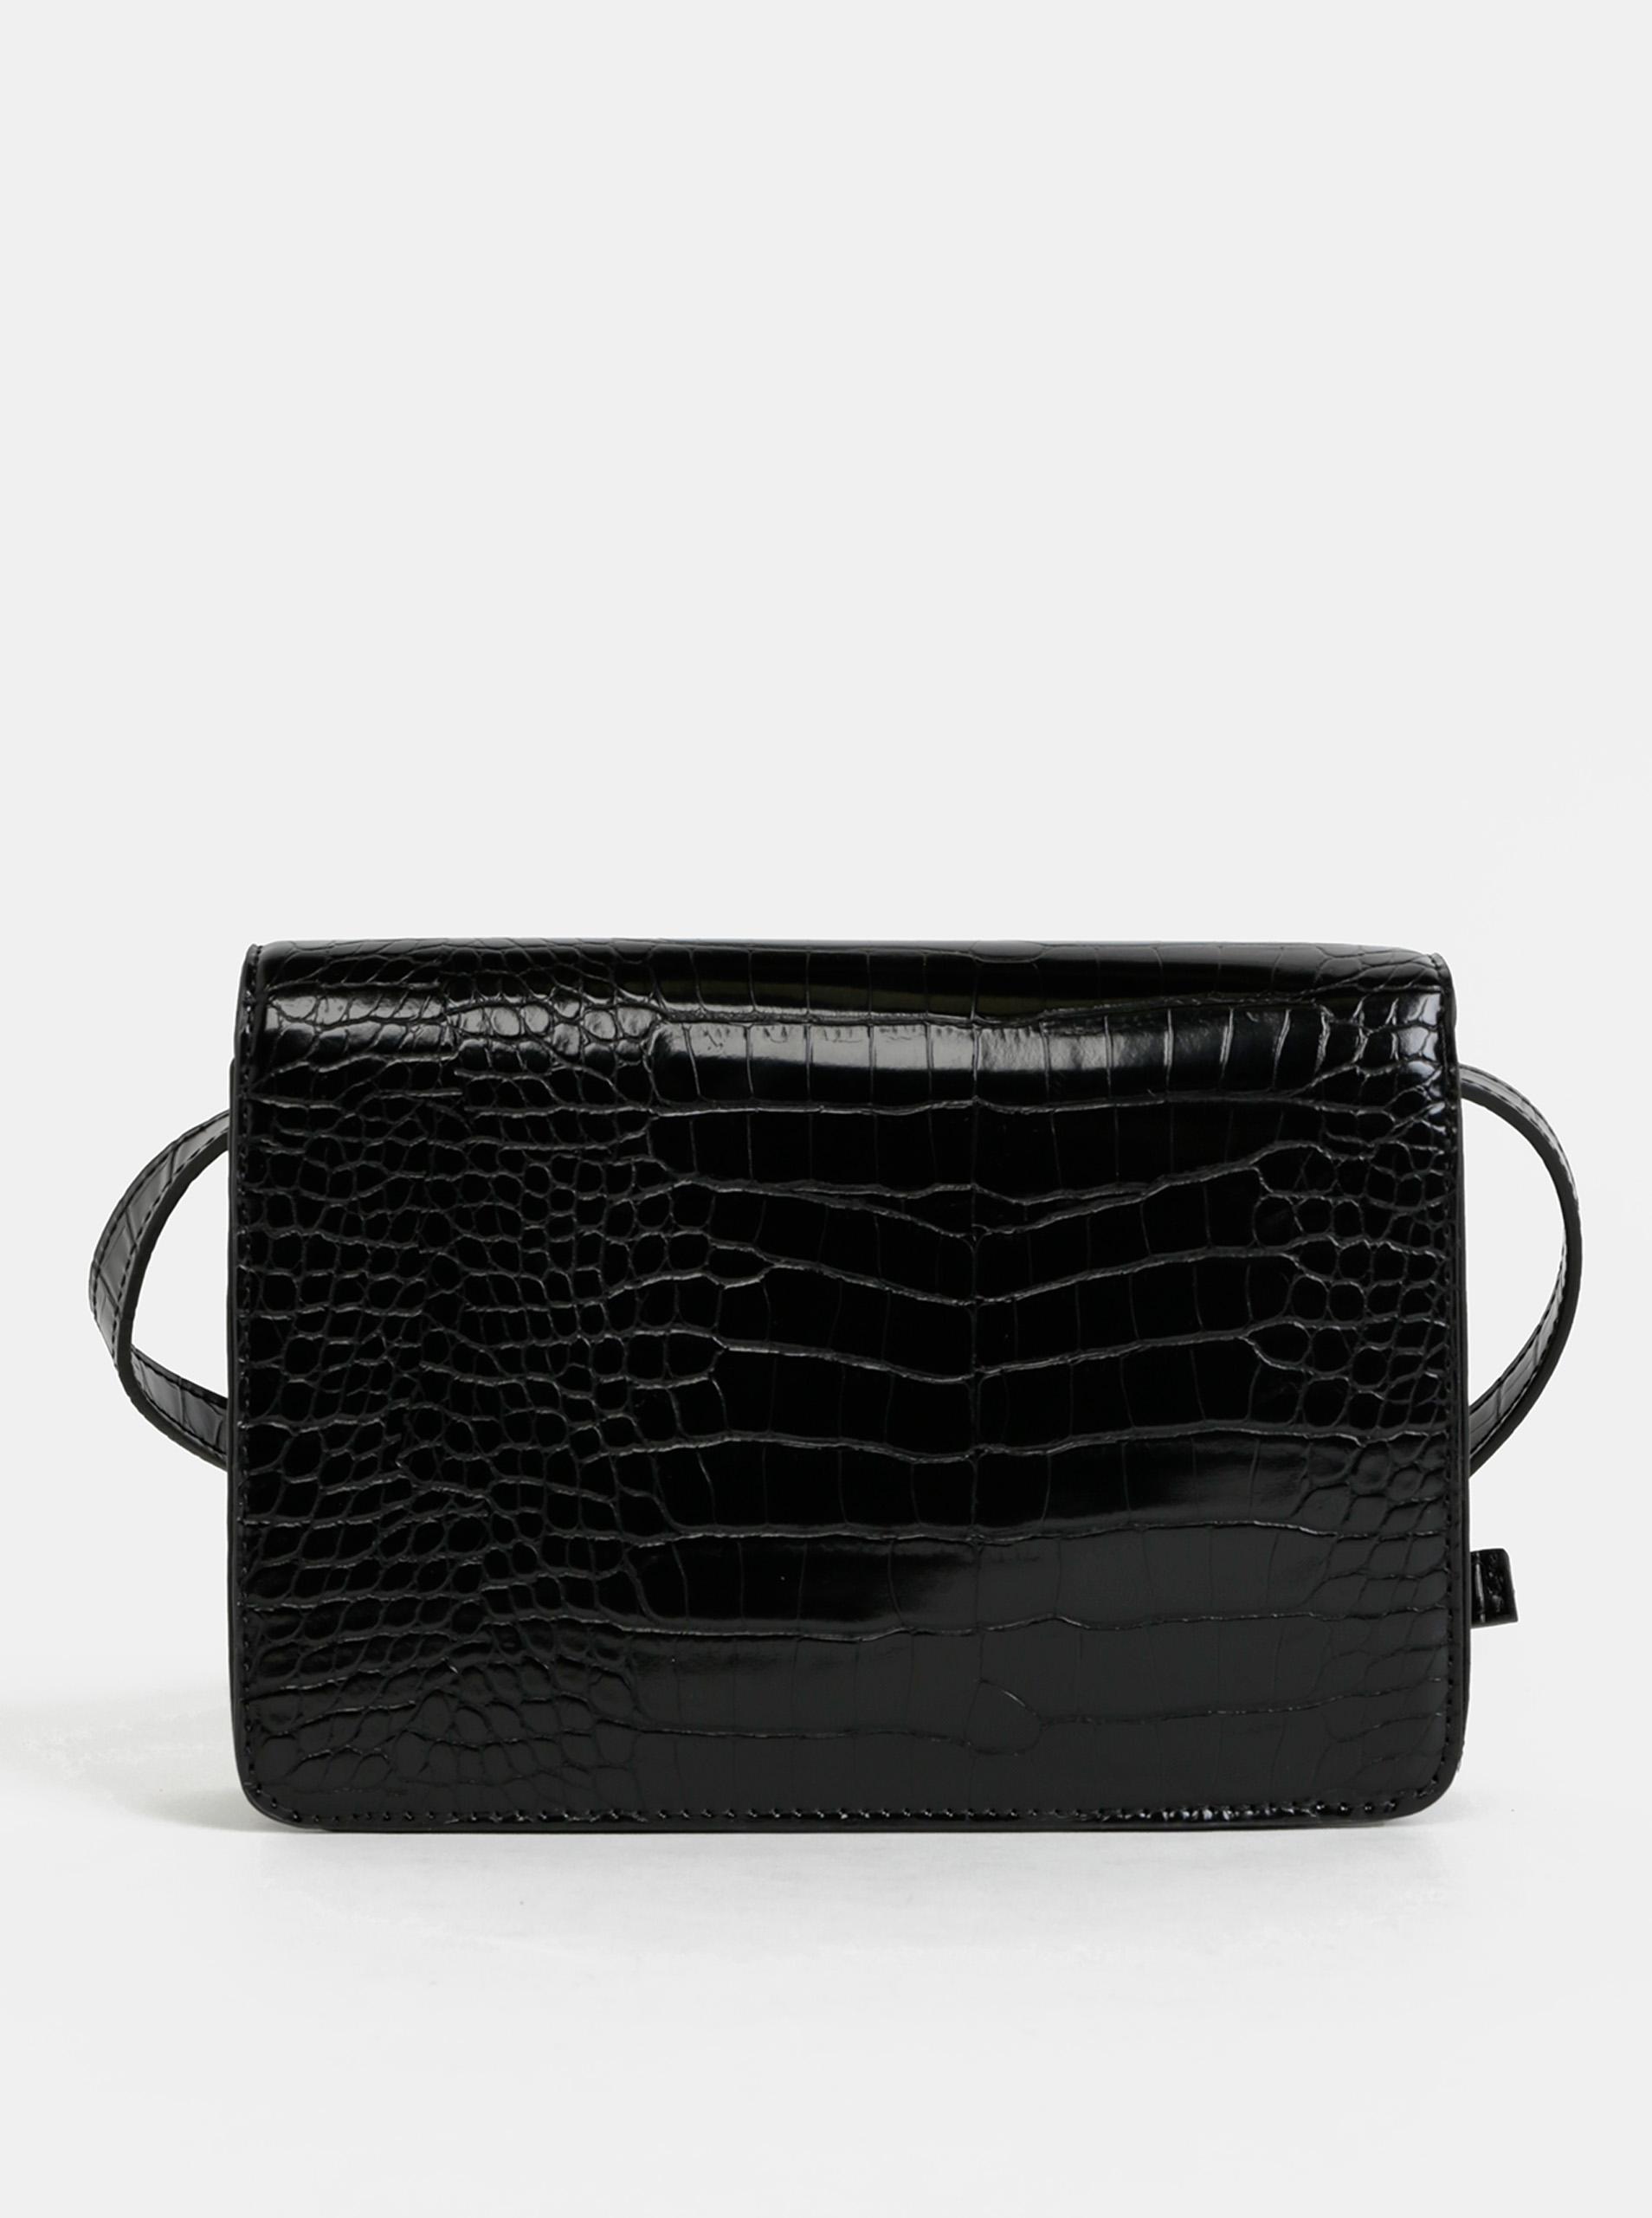 Pieces black crossbody handbag Julie